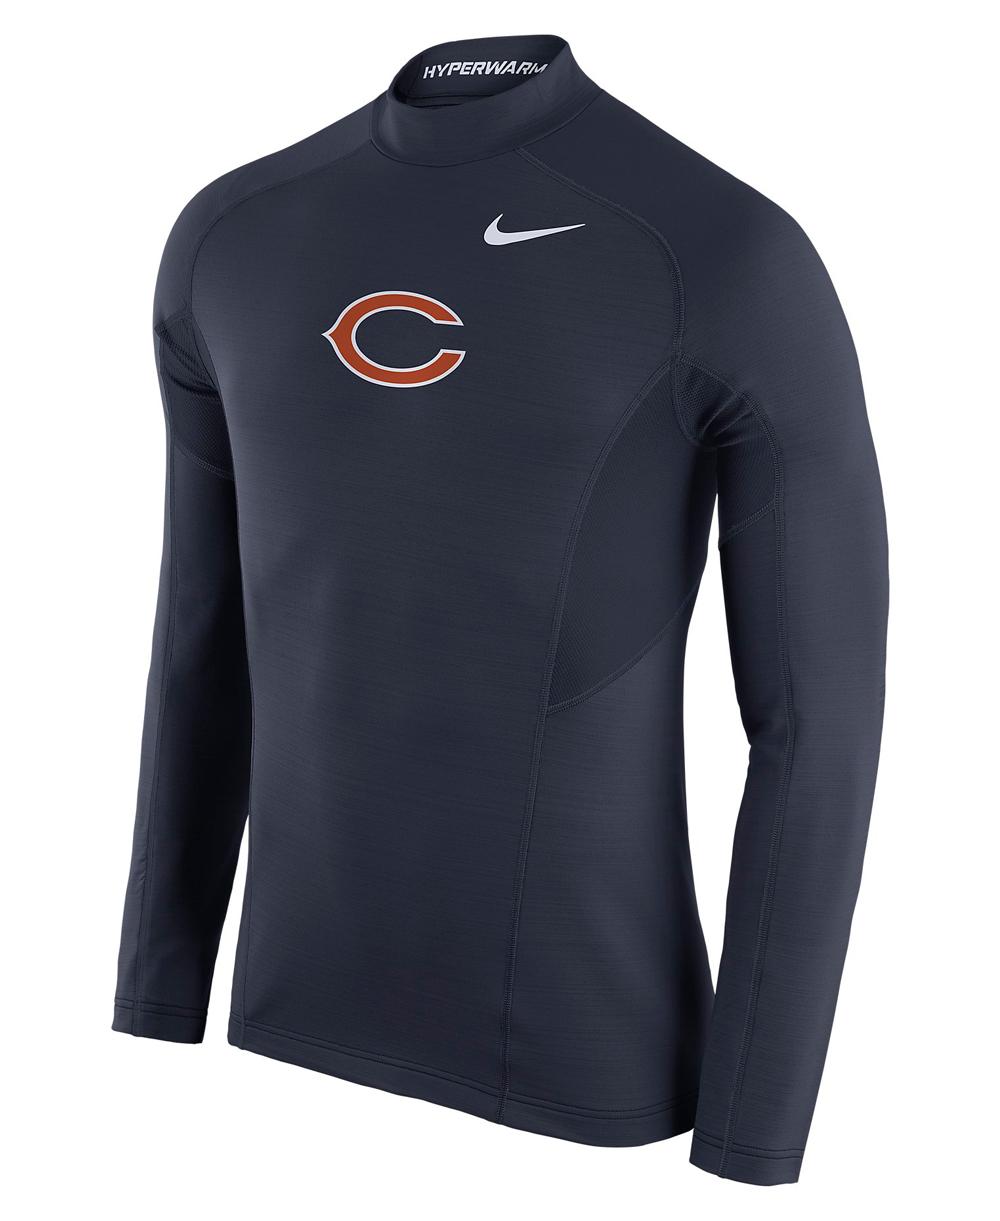 Pro Hyperwarm Max Fitted Camiseta de Compresión Manga Larga para Hombre NFL Bears